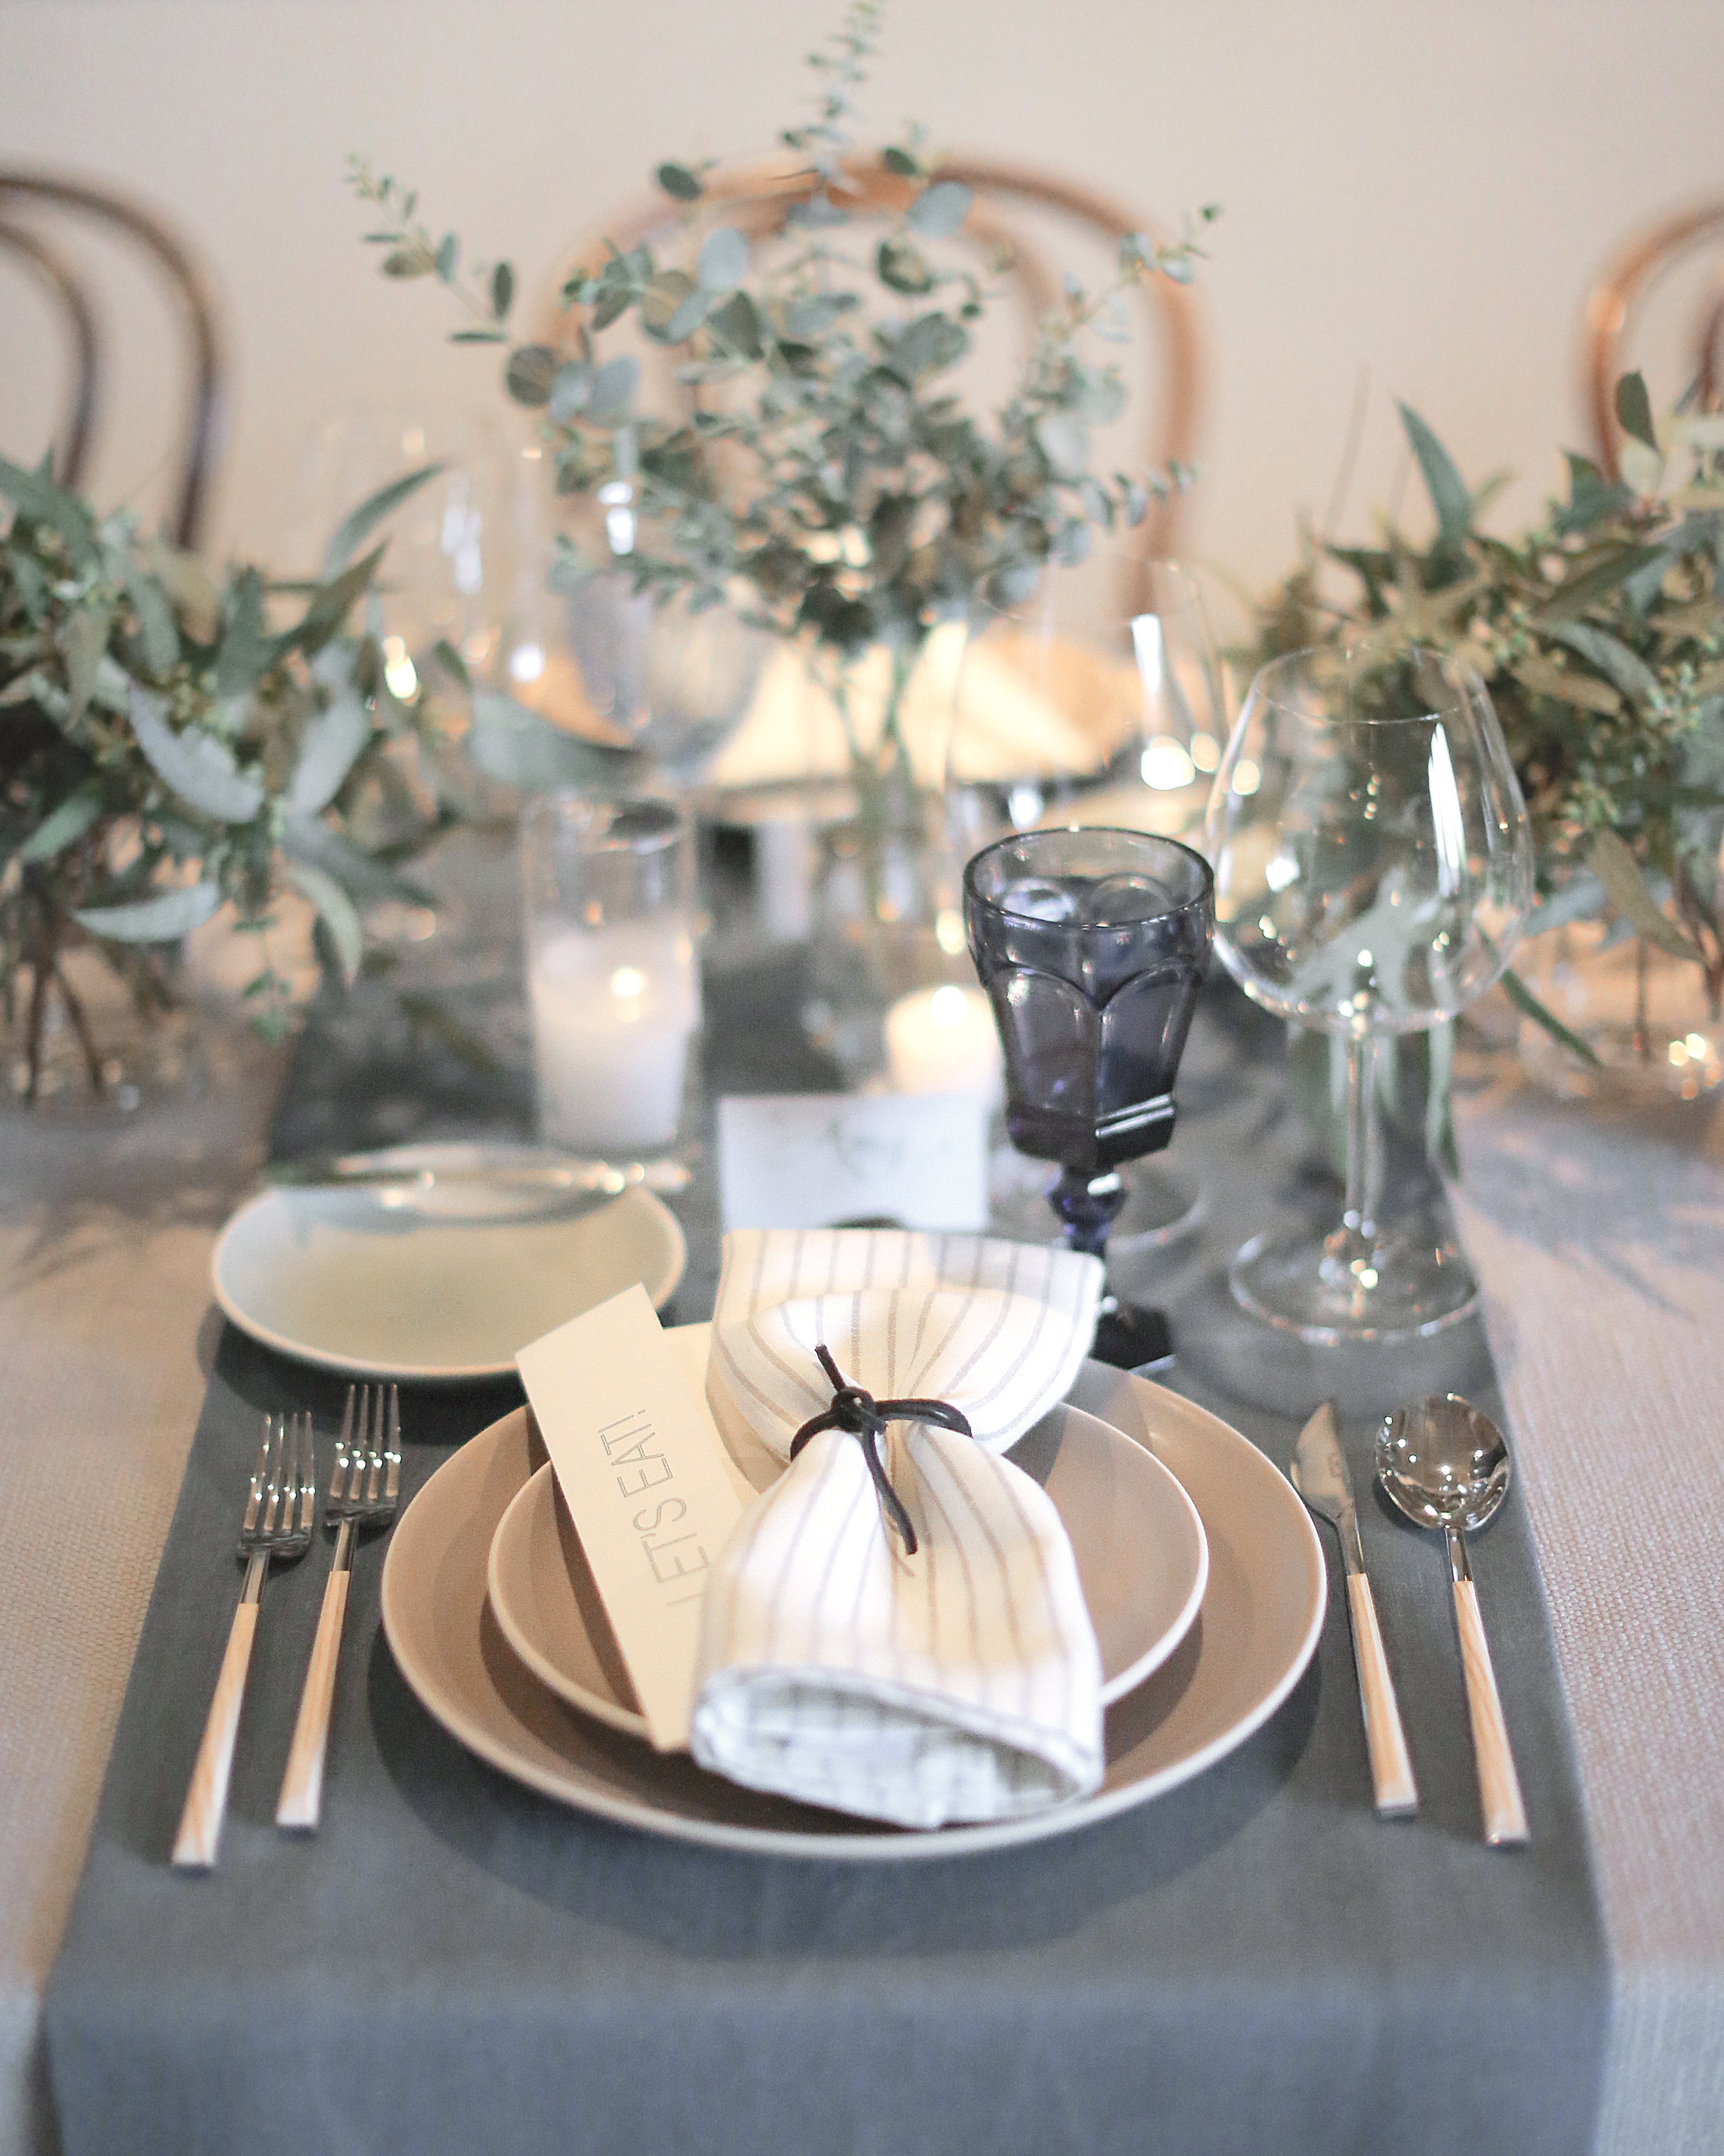 alison-markus-real-wedding-elizabeth-messina-167-ds111251.jpg